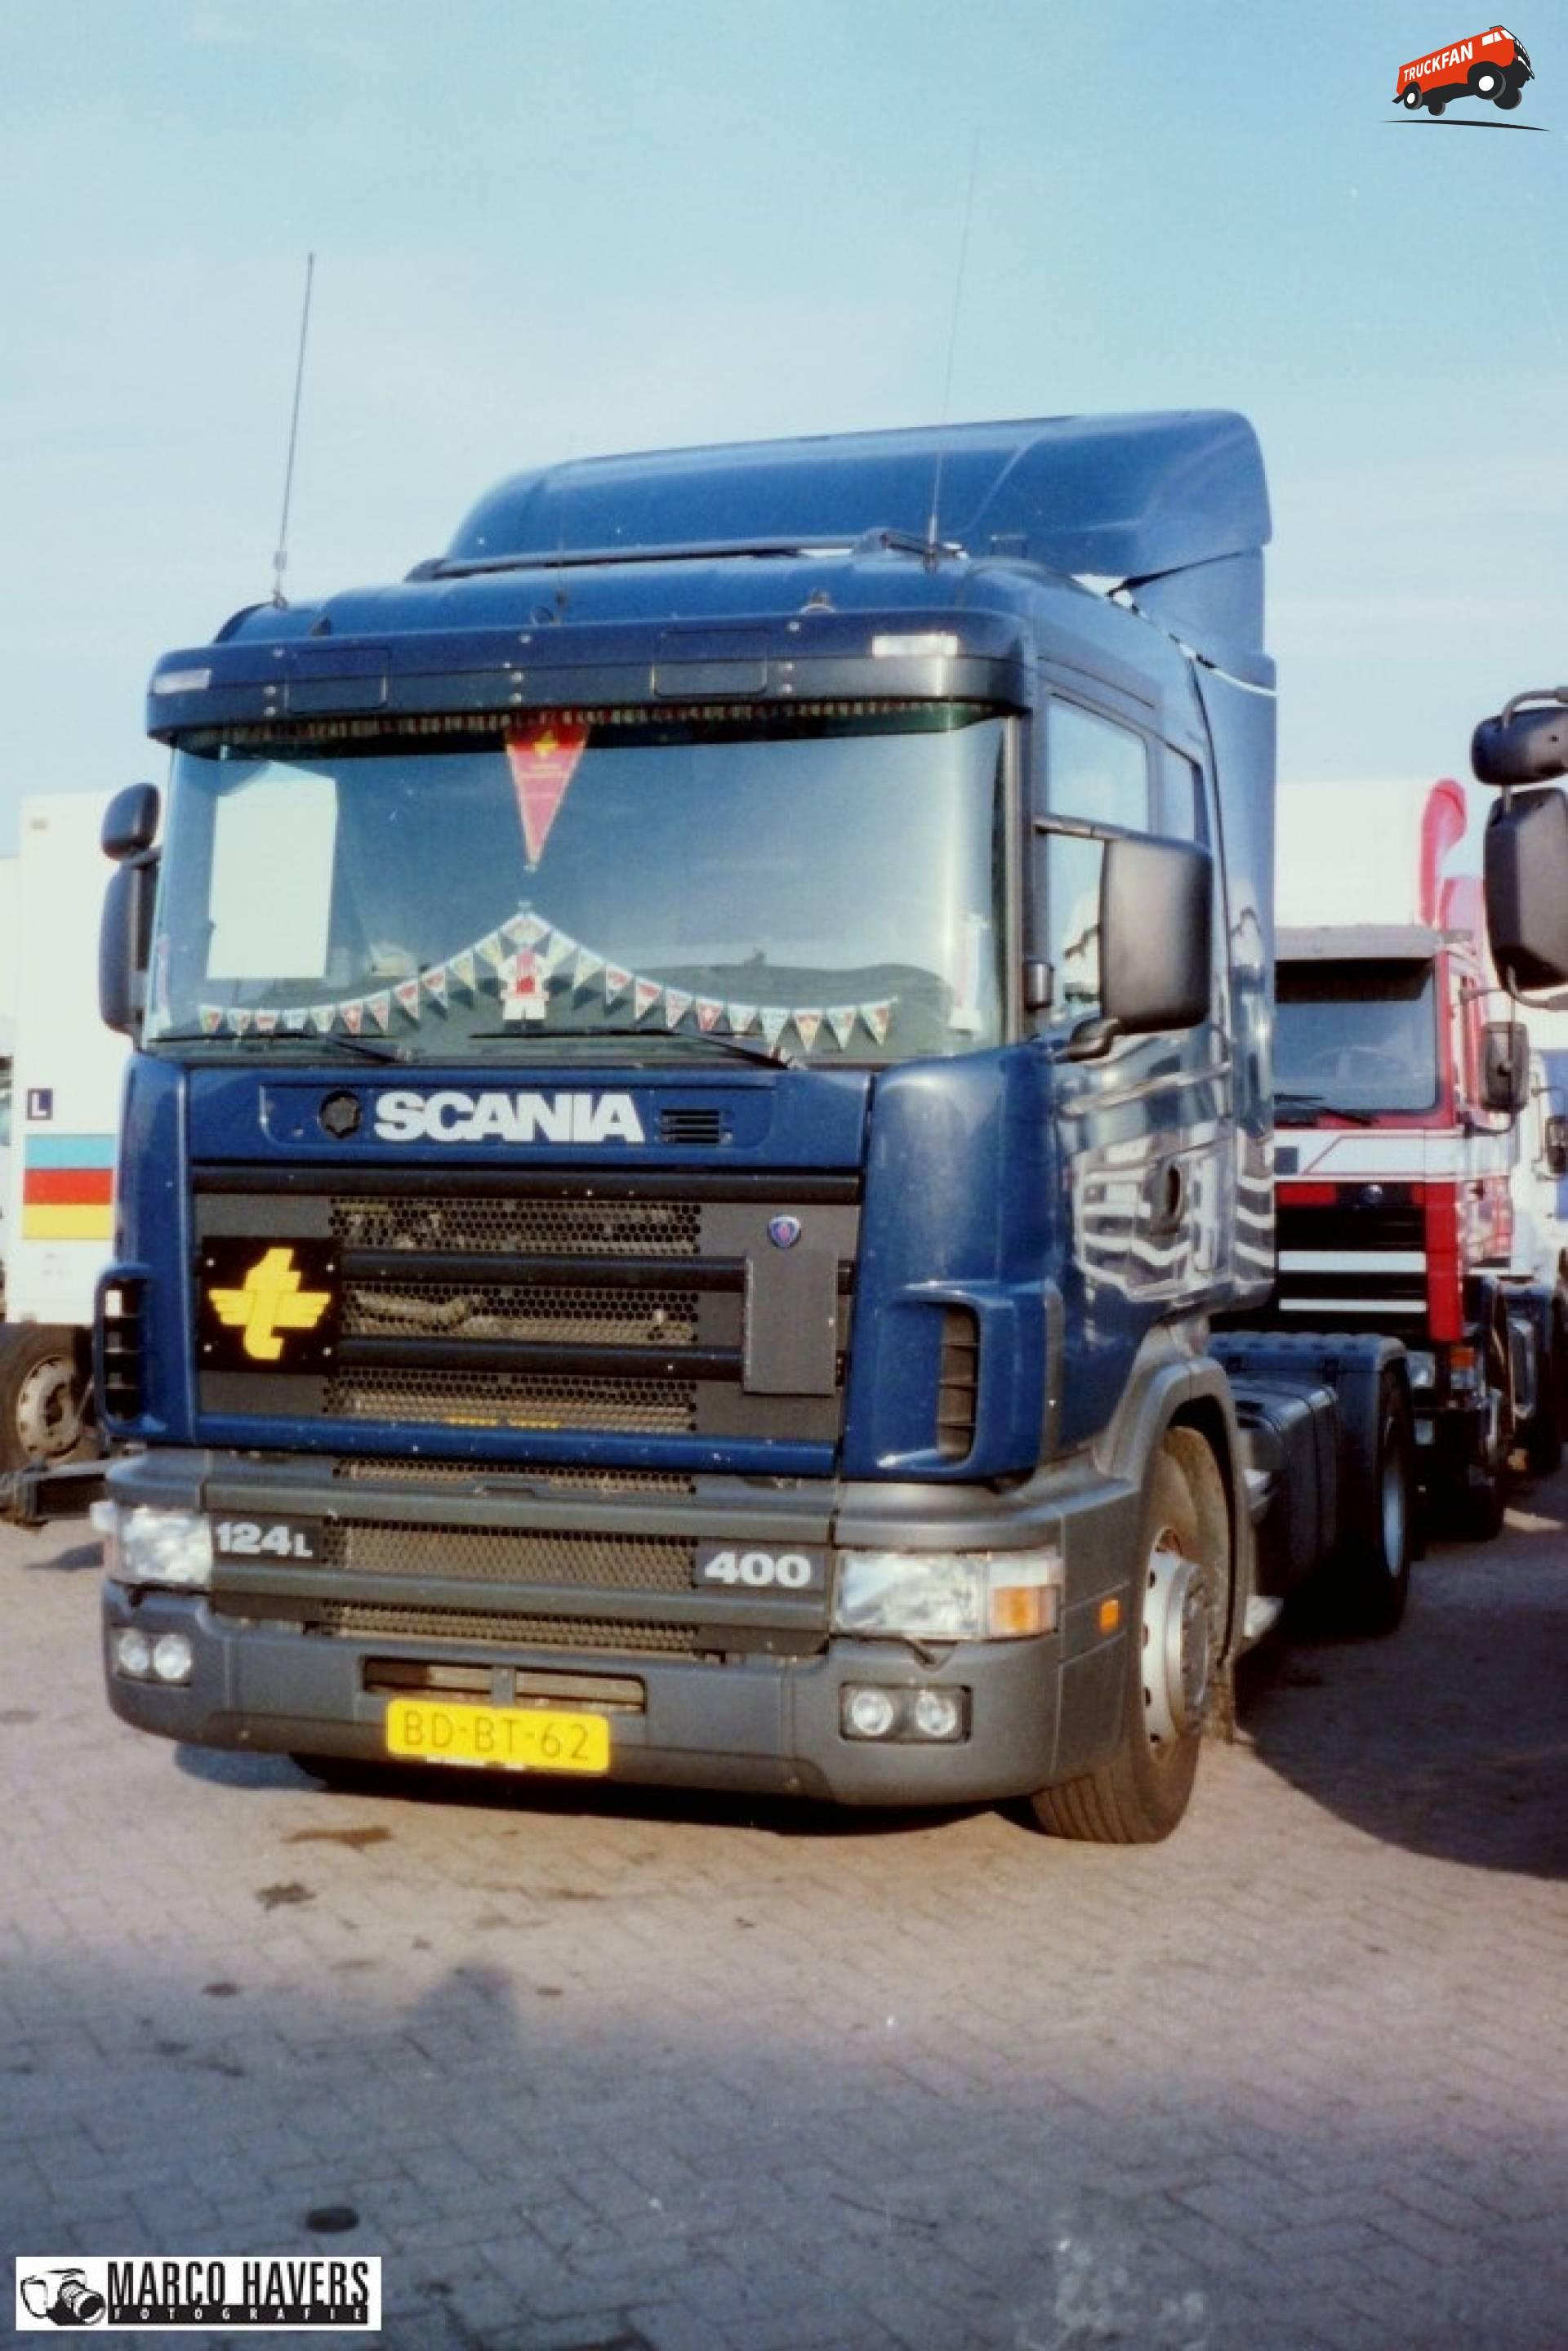 Scania 124